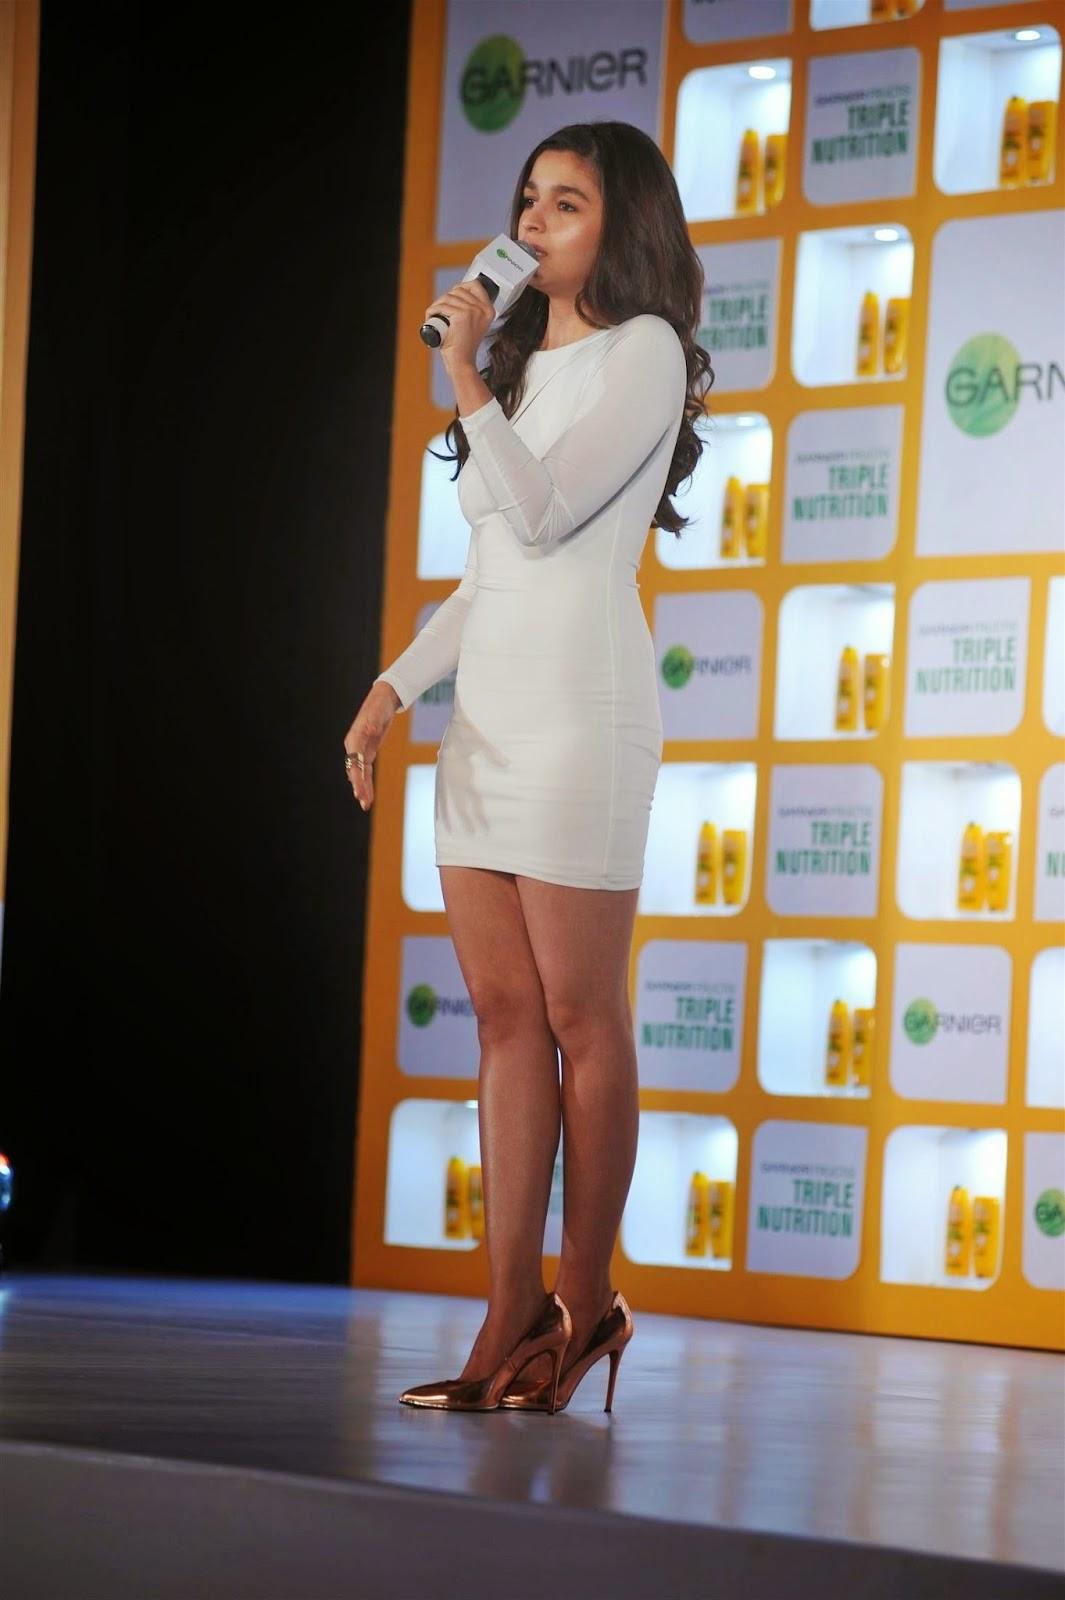 Alia Bhatt Legs Hd Hot Photos In Short Dress - 7 Pics-9416